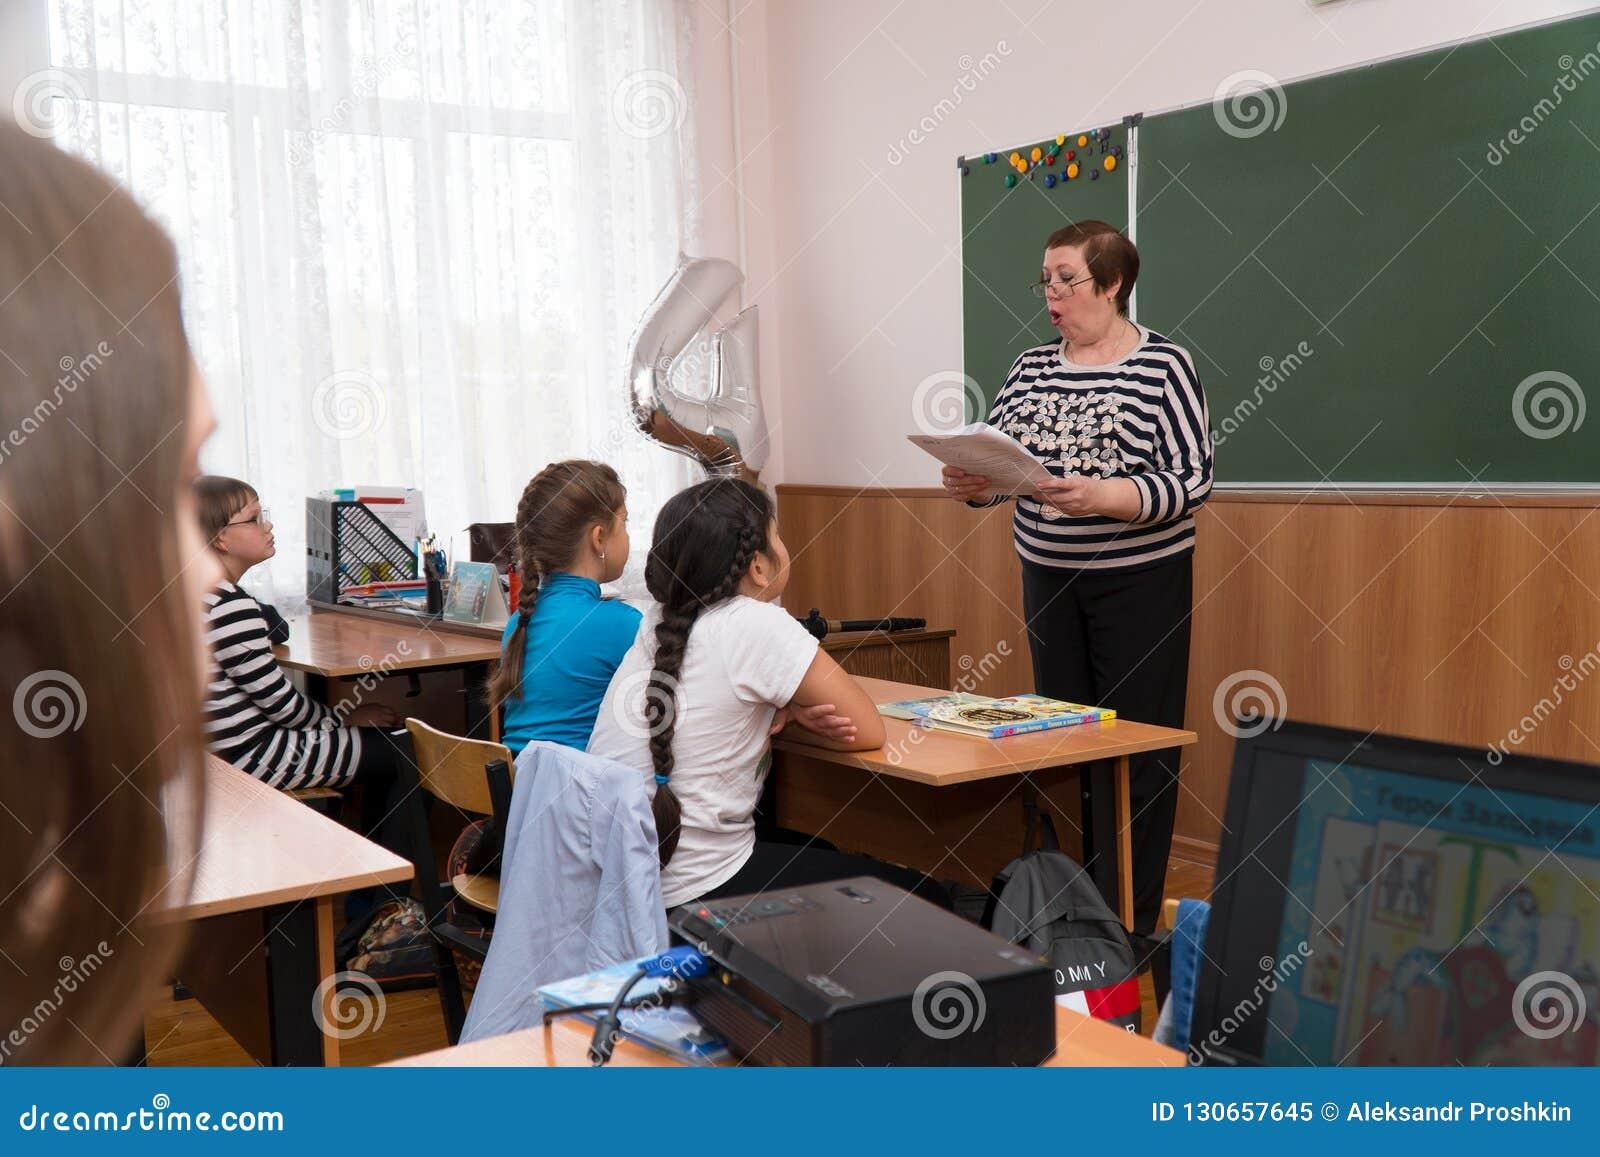 Teacher stands at the blackboard